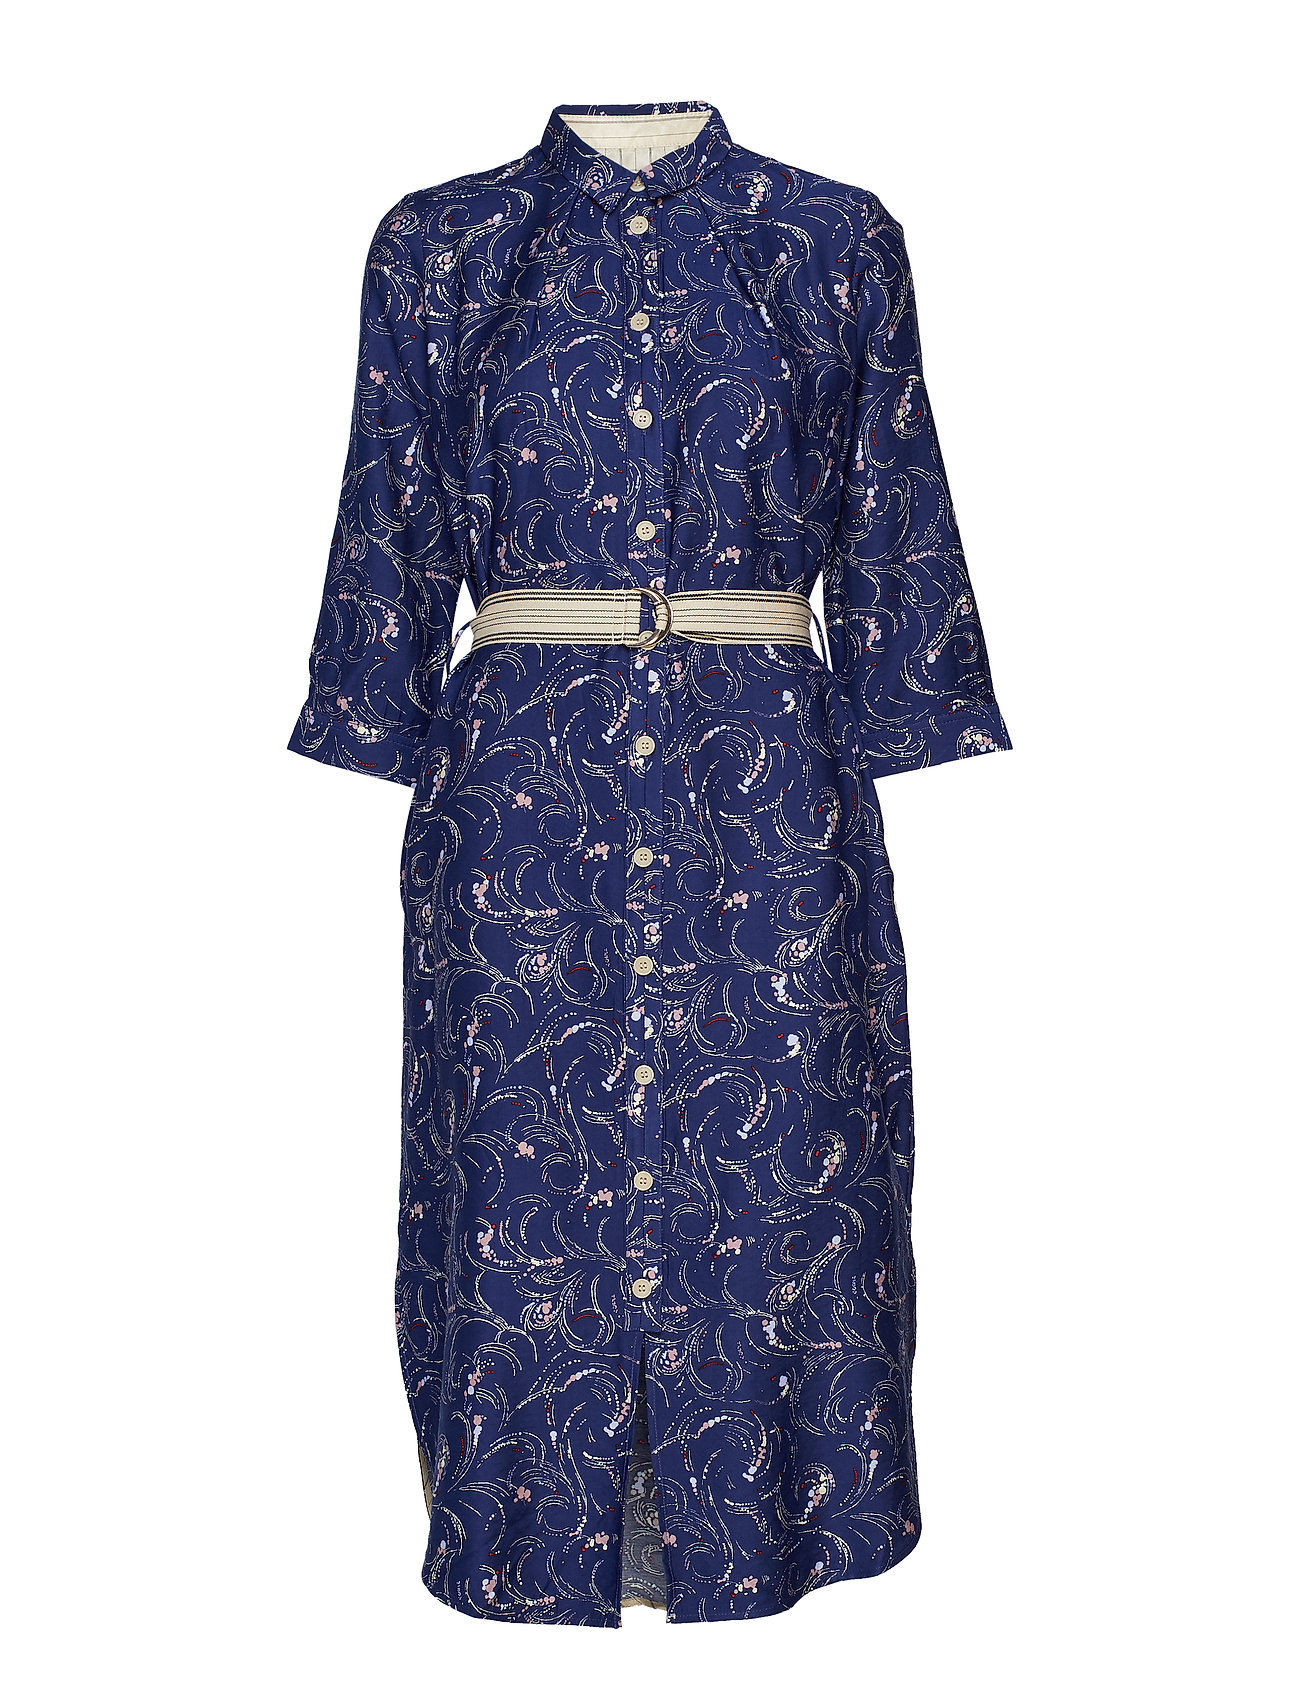 BlueNoa Long Sleeveprint Dress Sleeveprint Long Dress BlueNoa uPkZOXiT